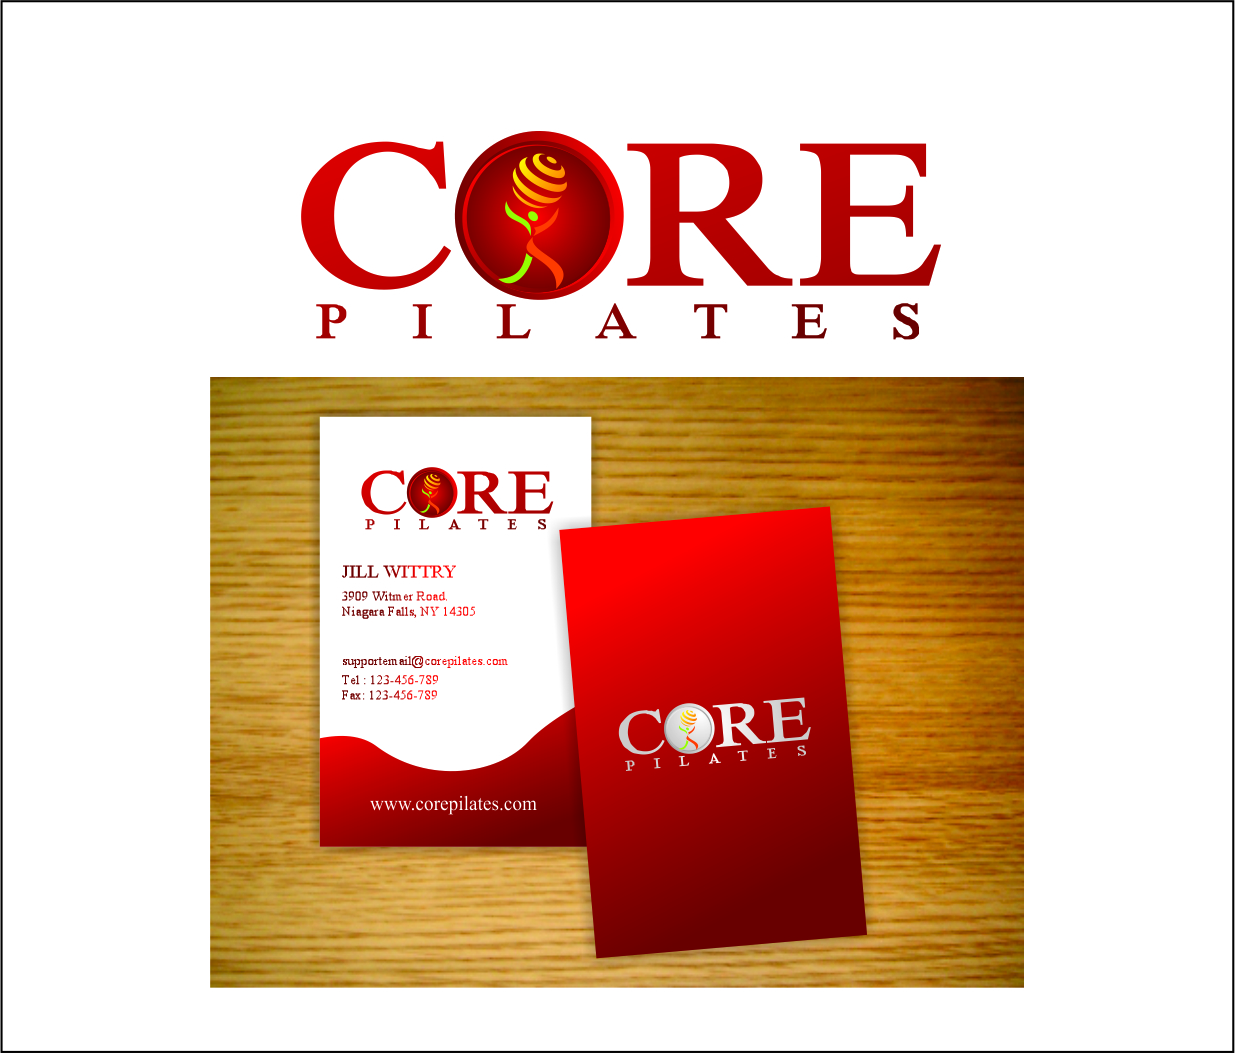 Logo Design by Hudy Wake - Entry No. 87 in the Logo Design Contest Core Pilates Logo Design.